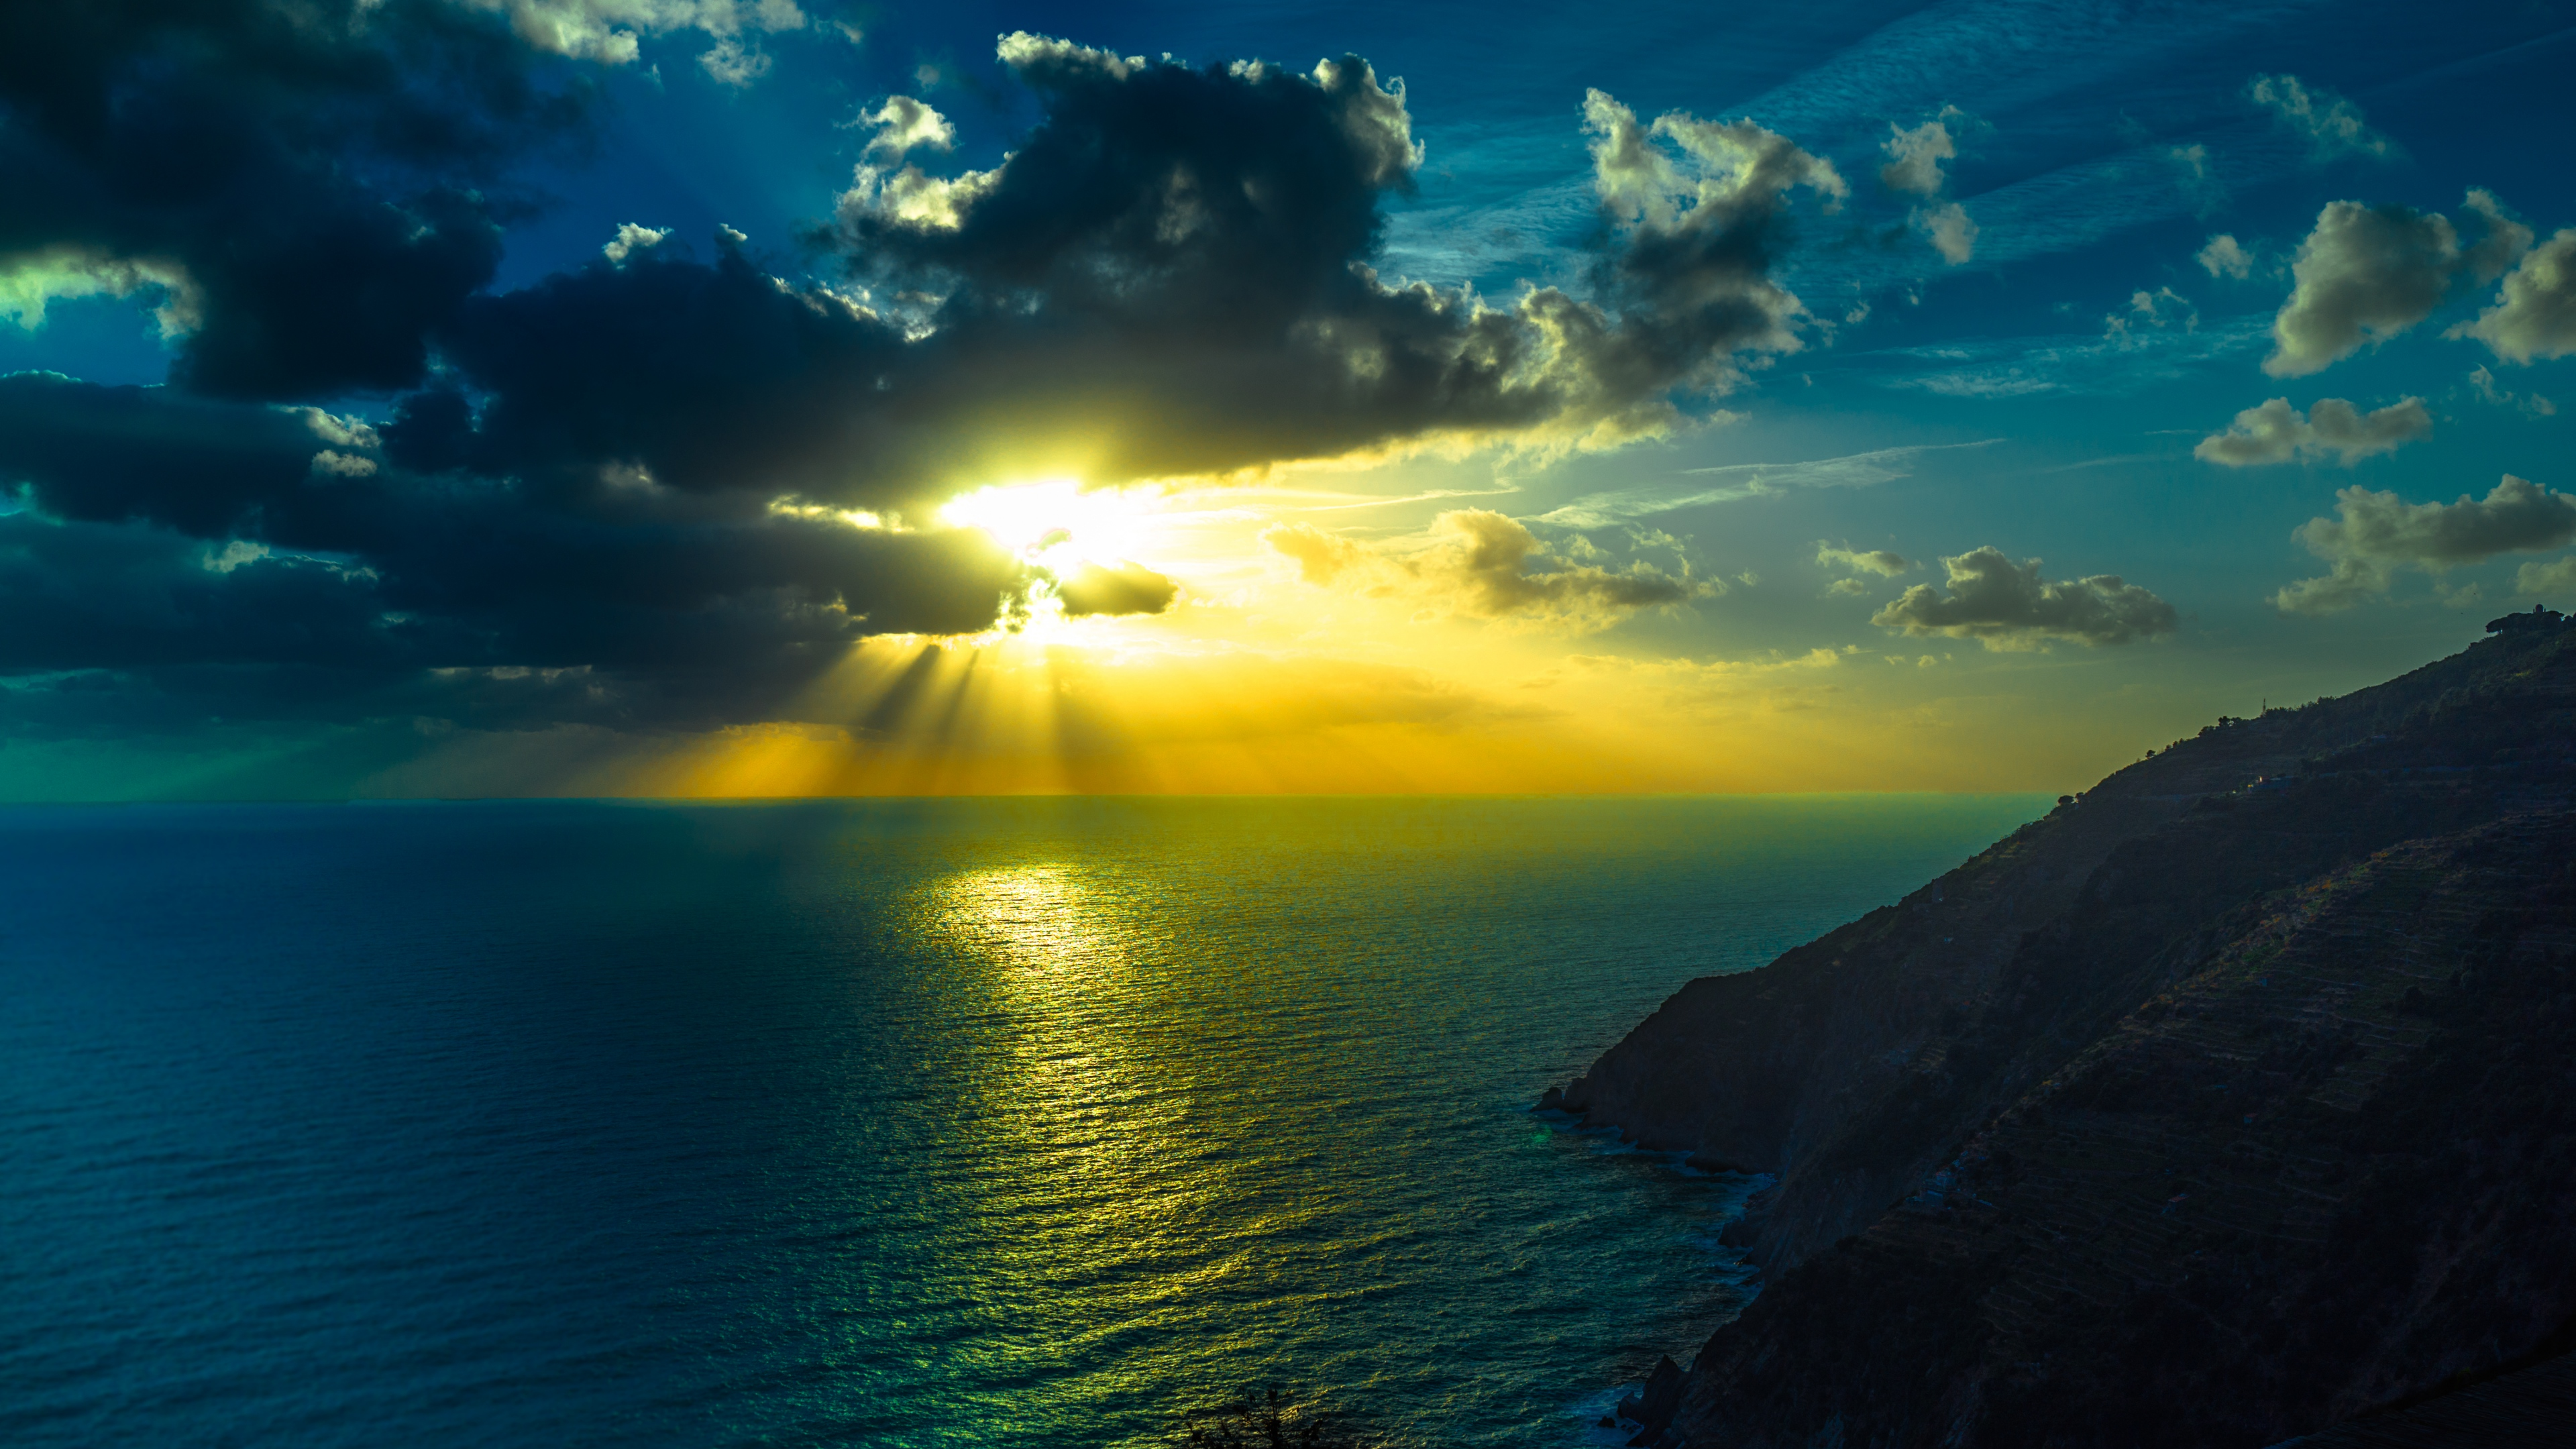 HD Wallpaper 3840x2160 mountains sea ocean clouds night 4K Ultra HD HD 3840x2160